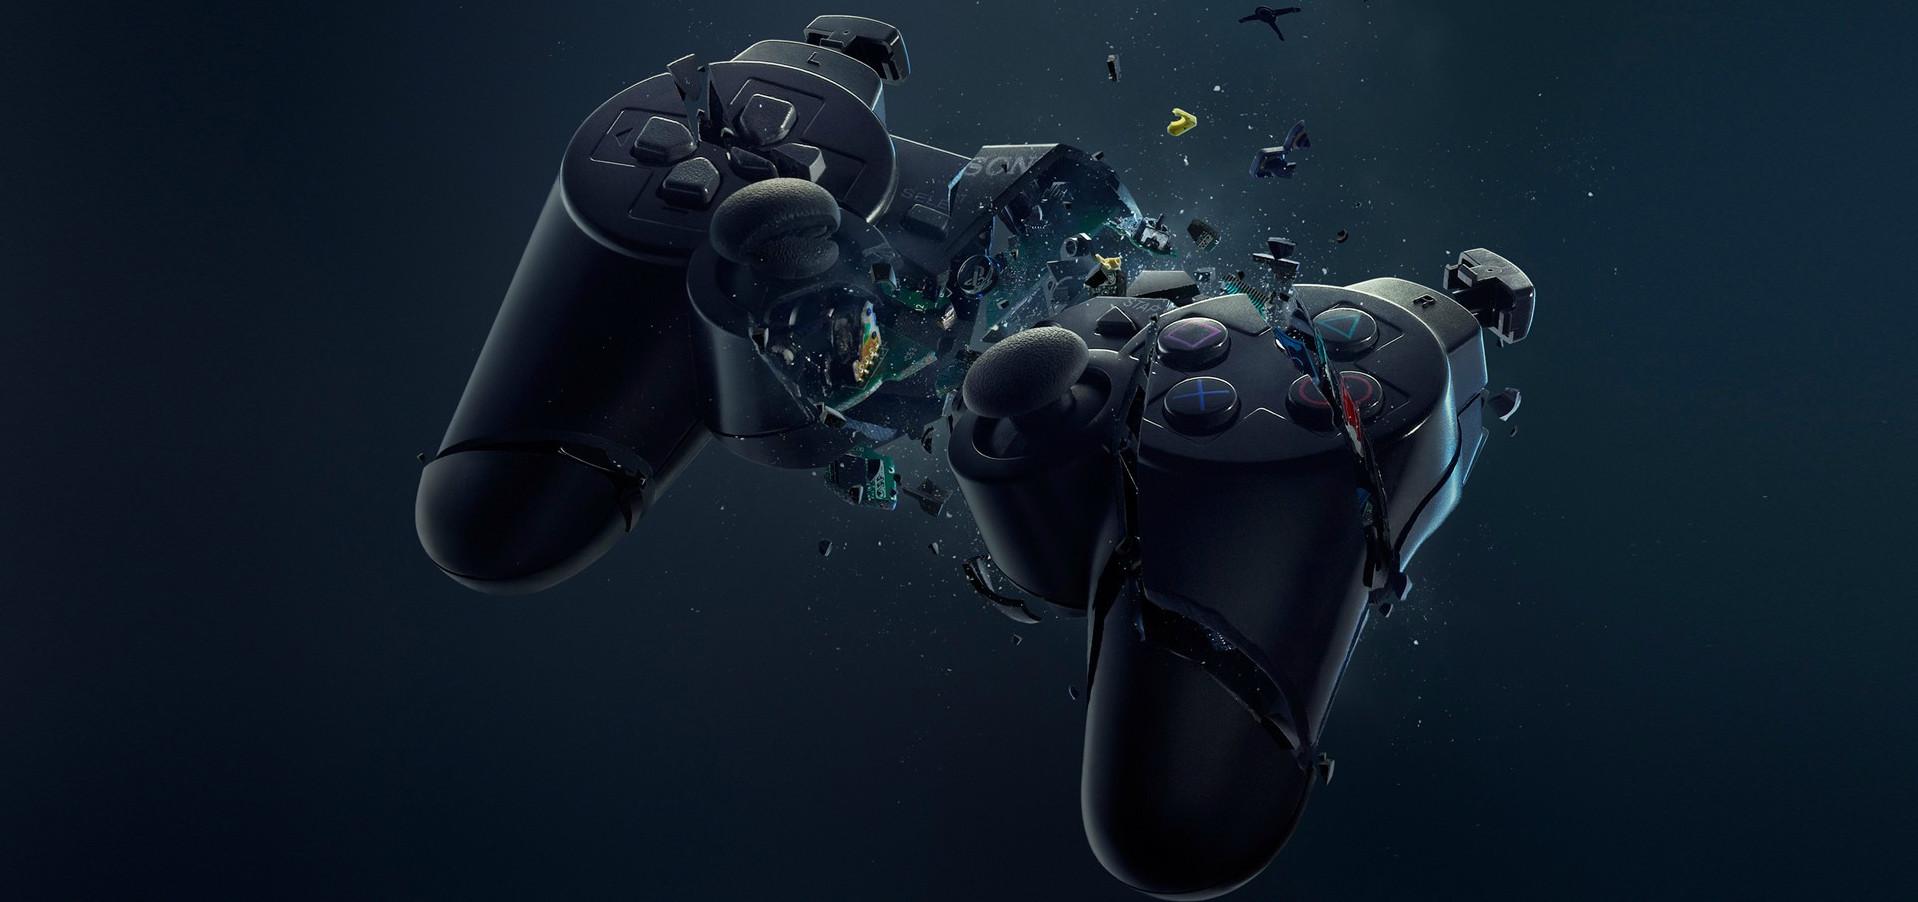 video games ps4 ηλεκτρονικα παιχνιδια ικαρία